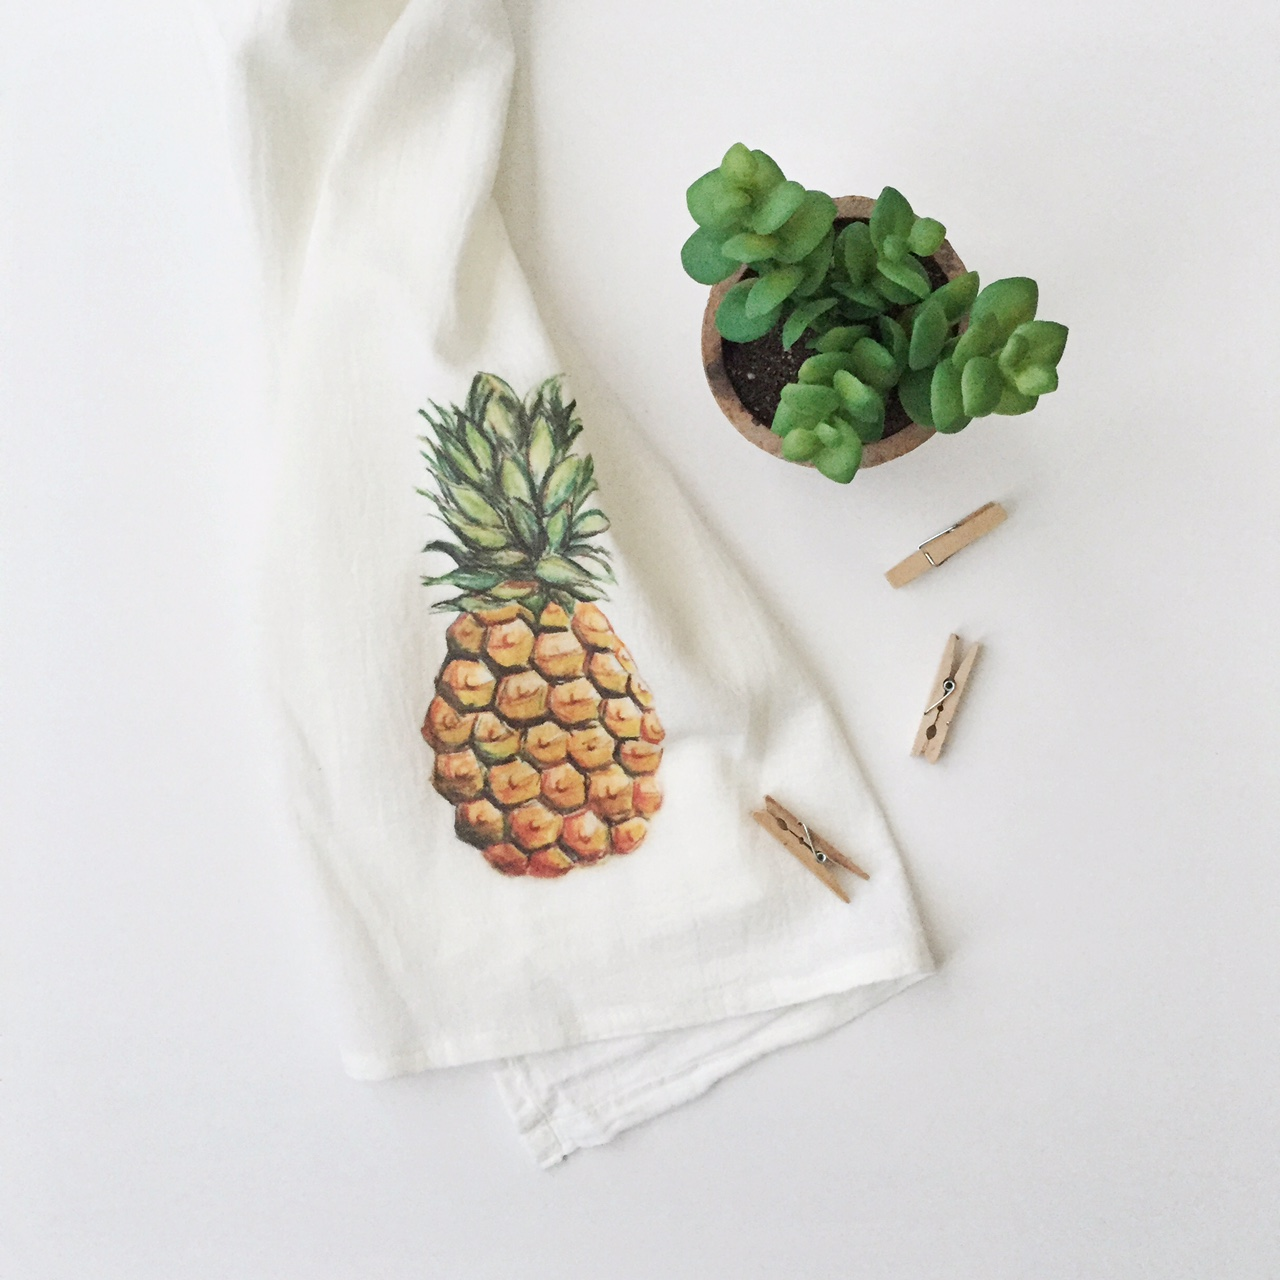 7P_FlourSackTowel-Pineapple.JPG